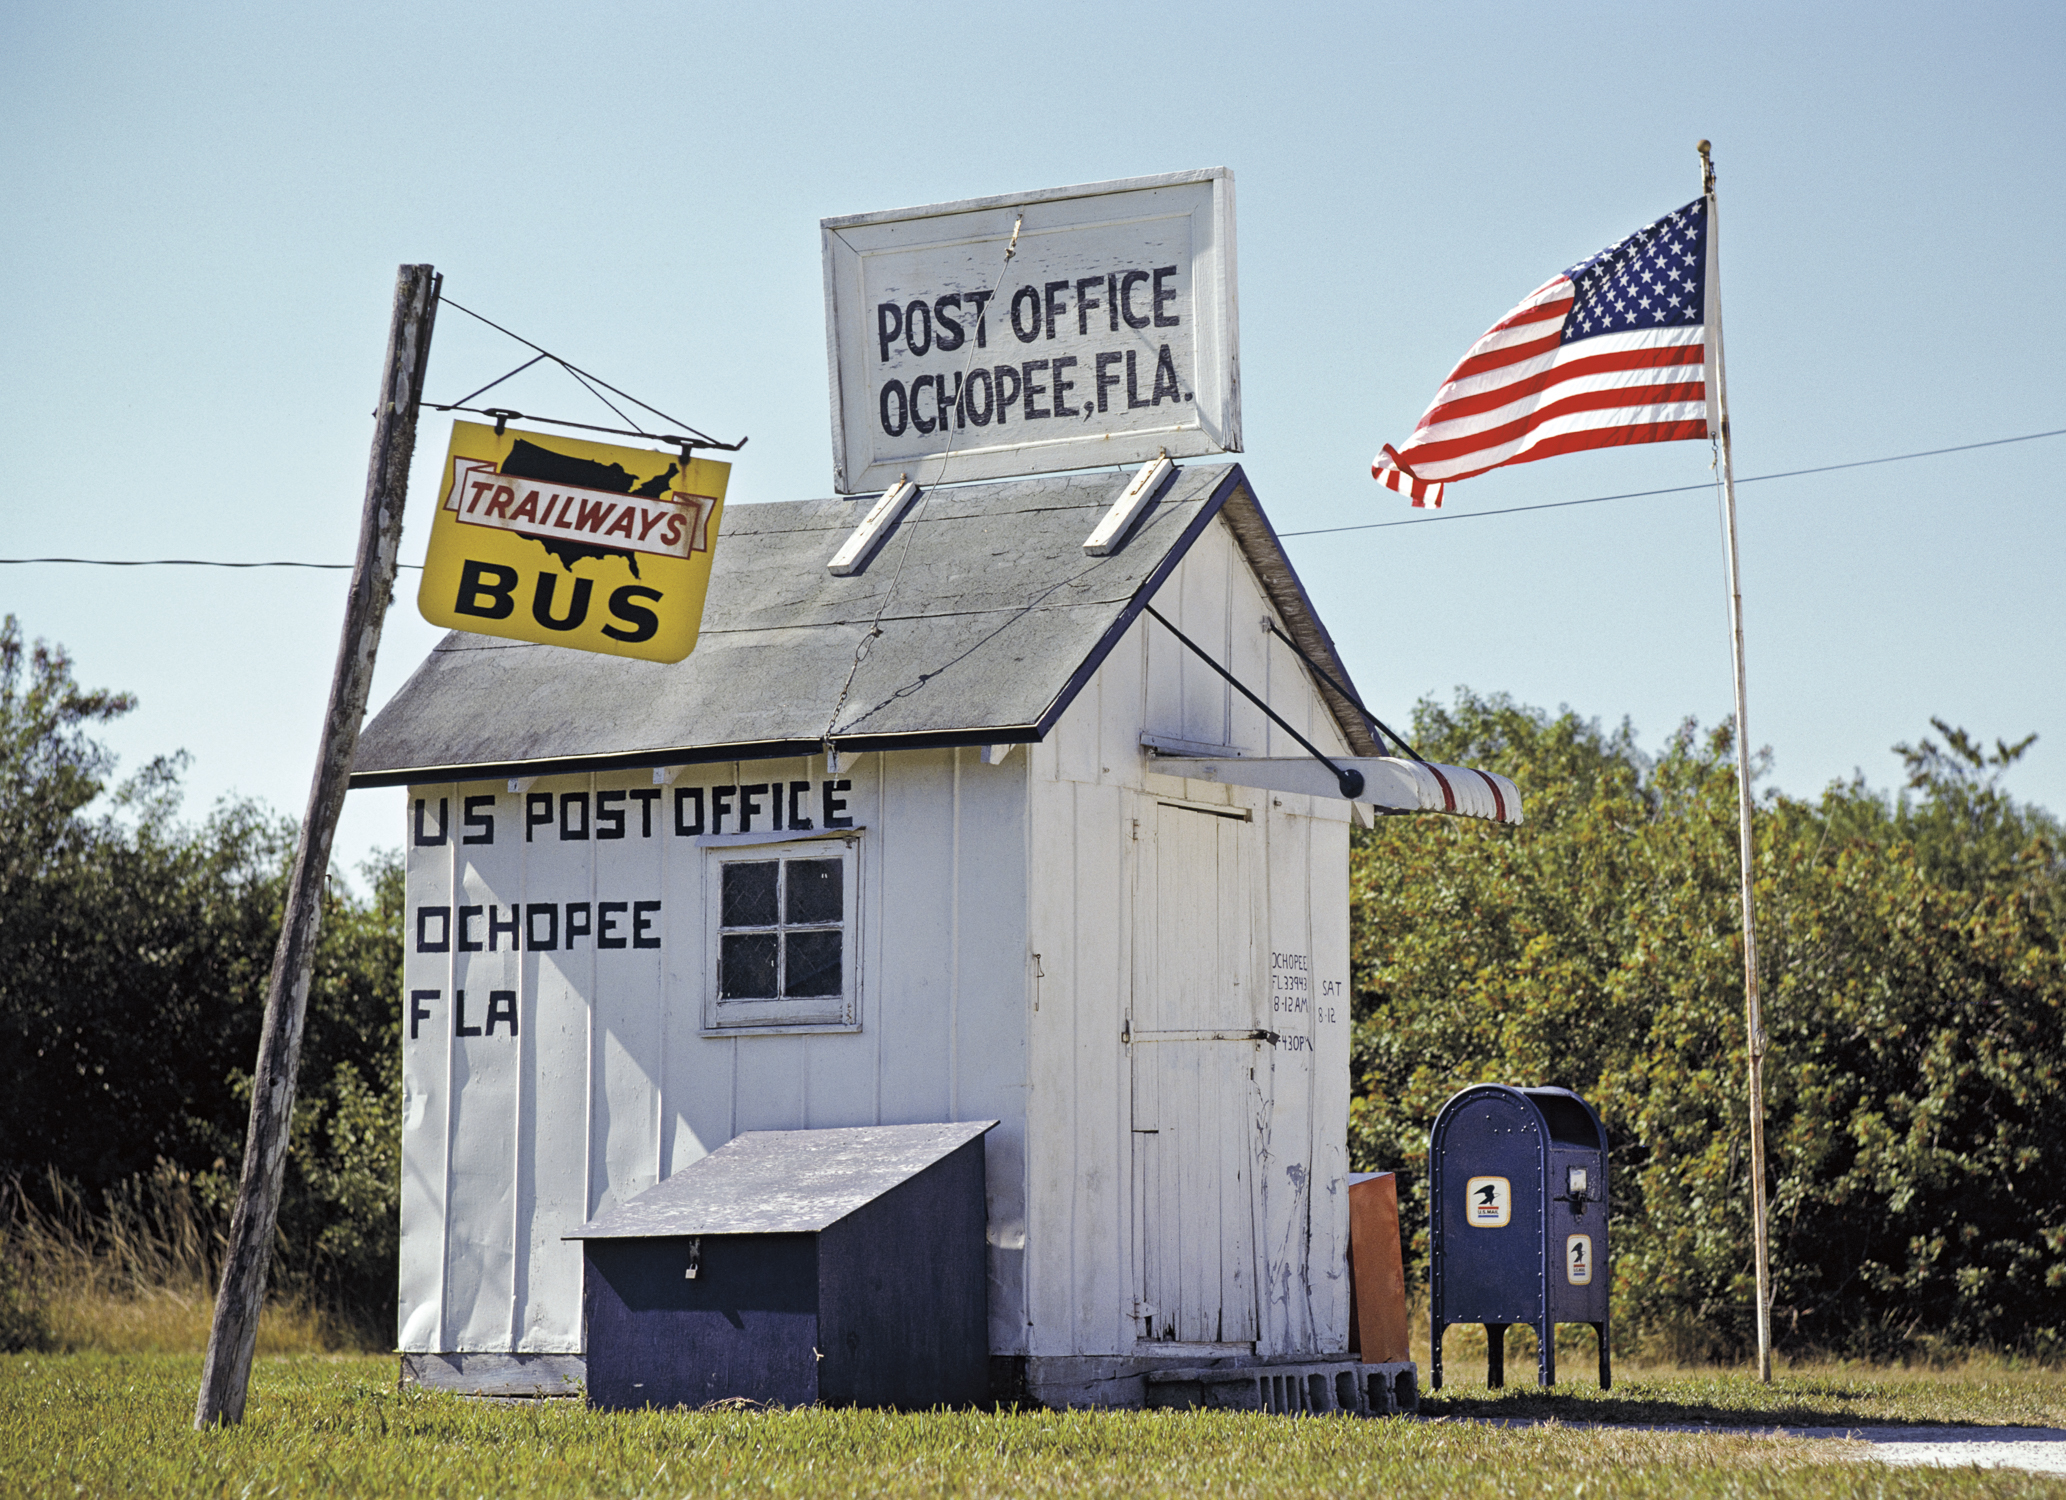 Ochopee Post Office | Oficina de correos de Ochopee, Everglades